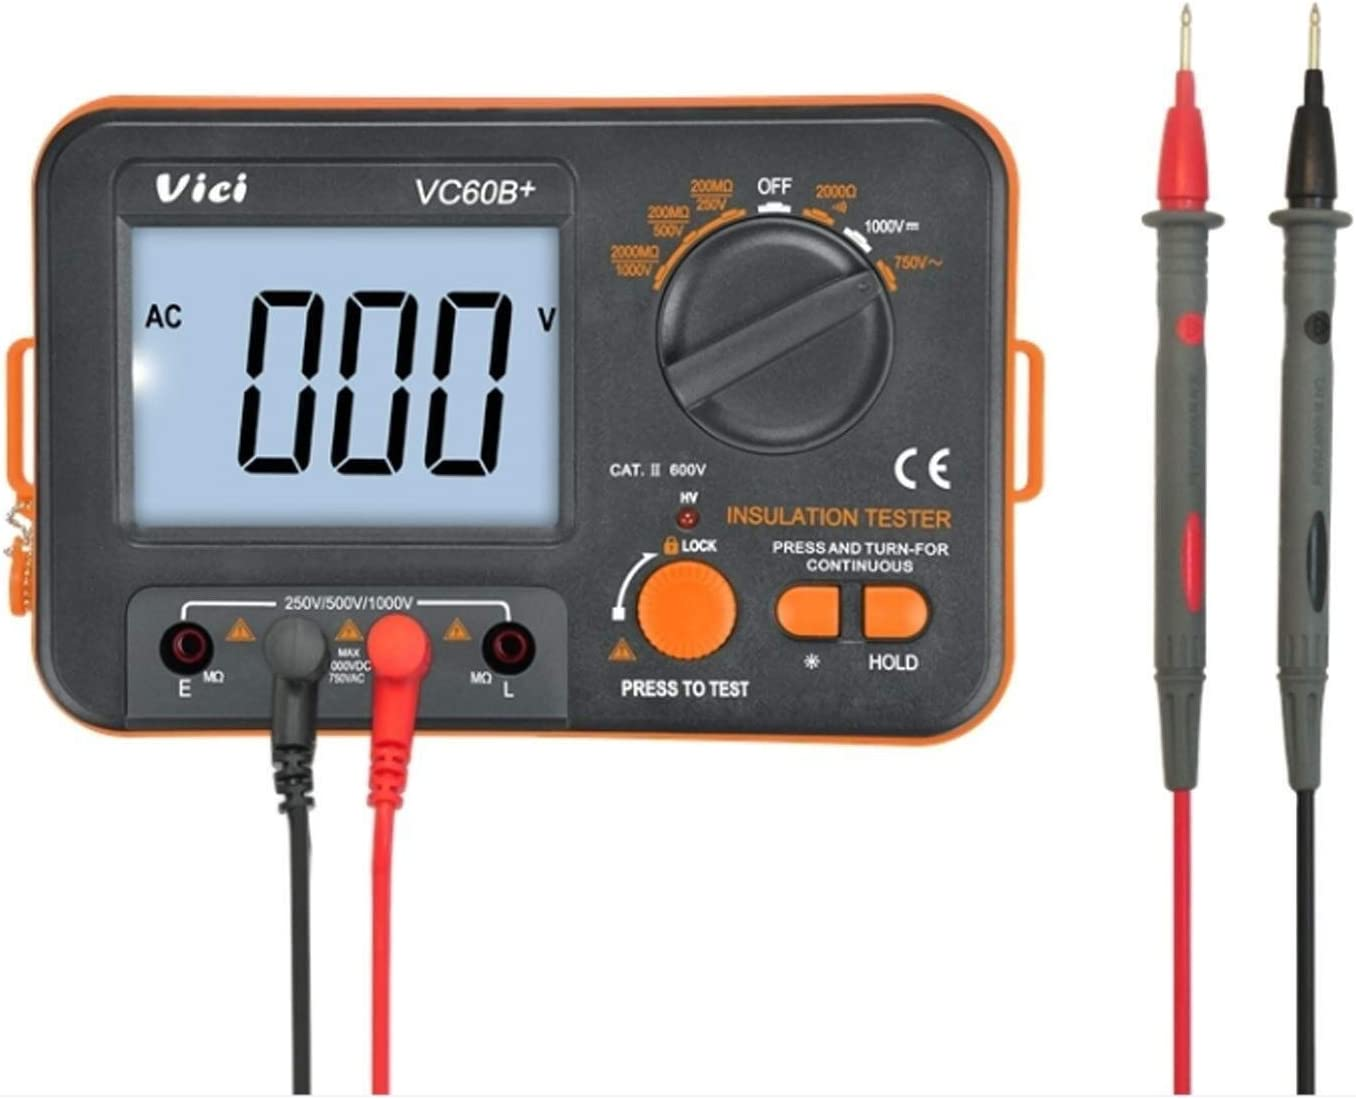 YISUNF Precise instrument Digital insulation resistance tester VC60B insulation testing machine mega oh meter 250 V 500 V 1000 V high voltage and short circuit input alarm Resistance Tester